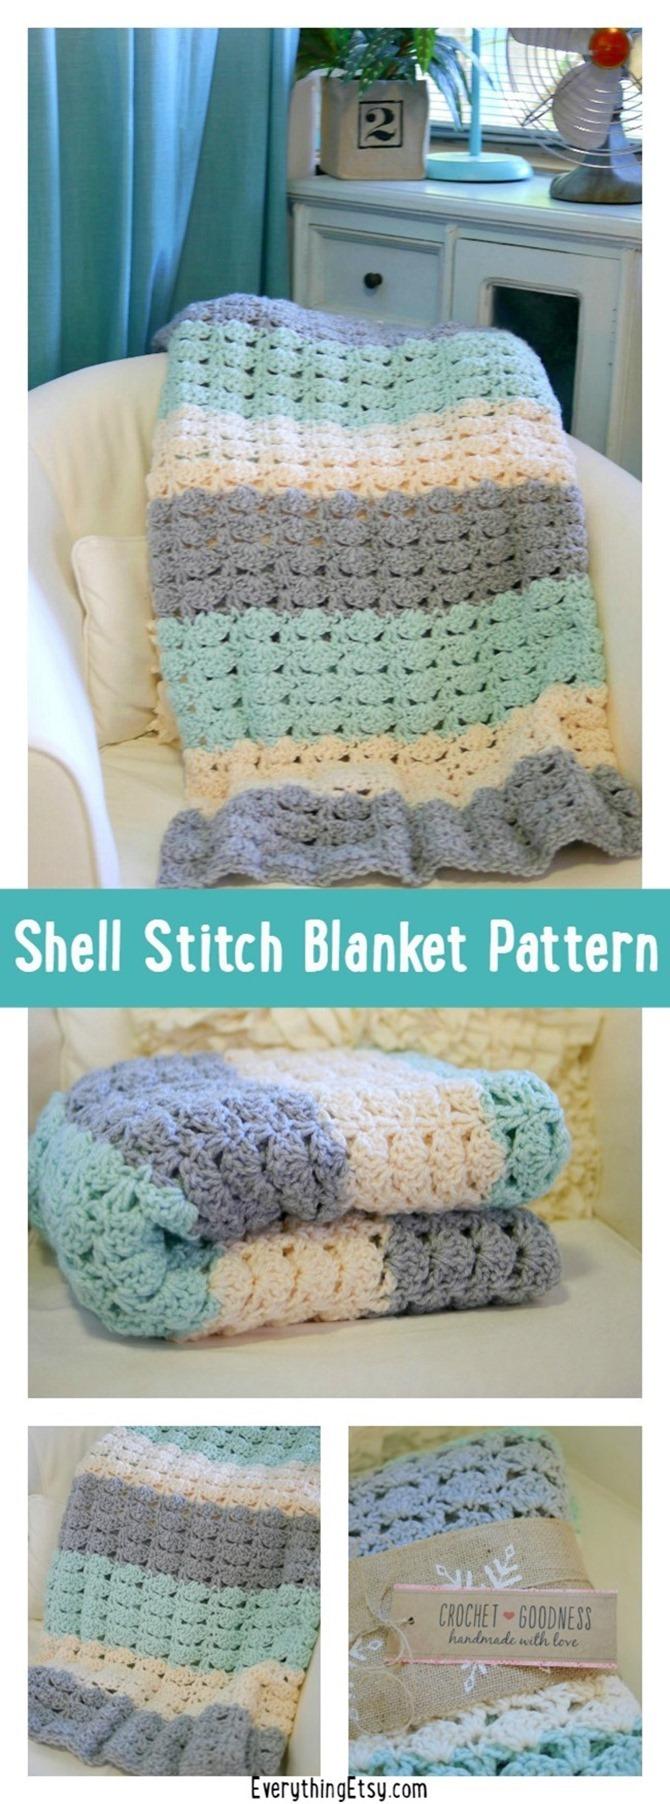 free-crochet-blanket-pattern-shell-stitch